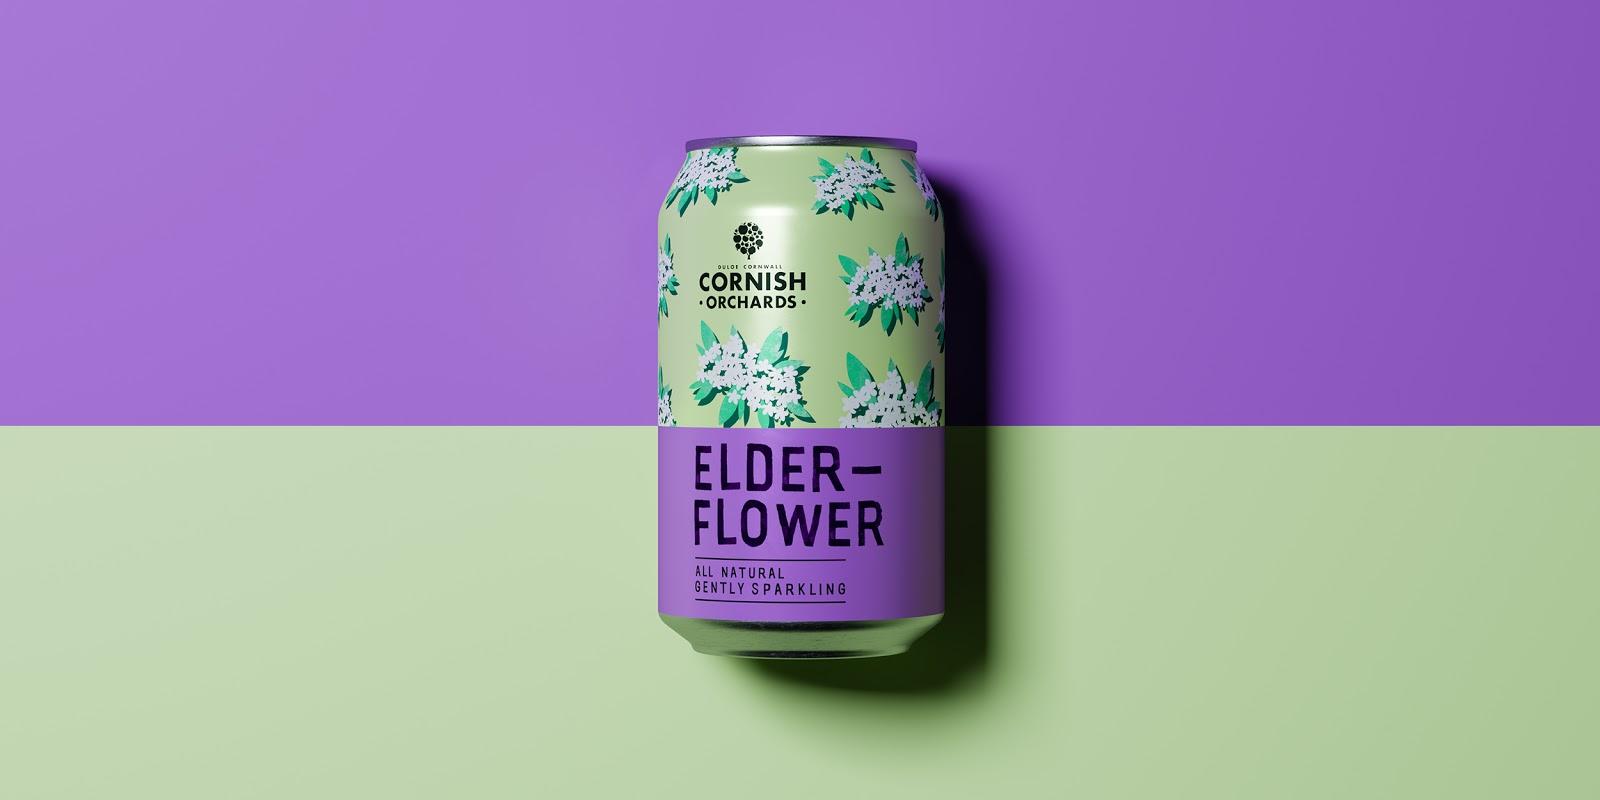 Cornish Orchards果汁包装设计